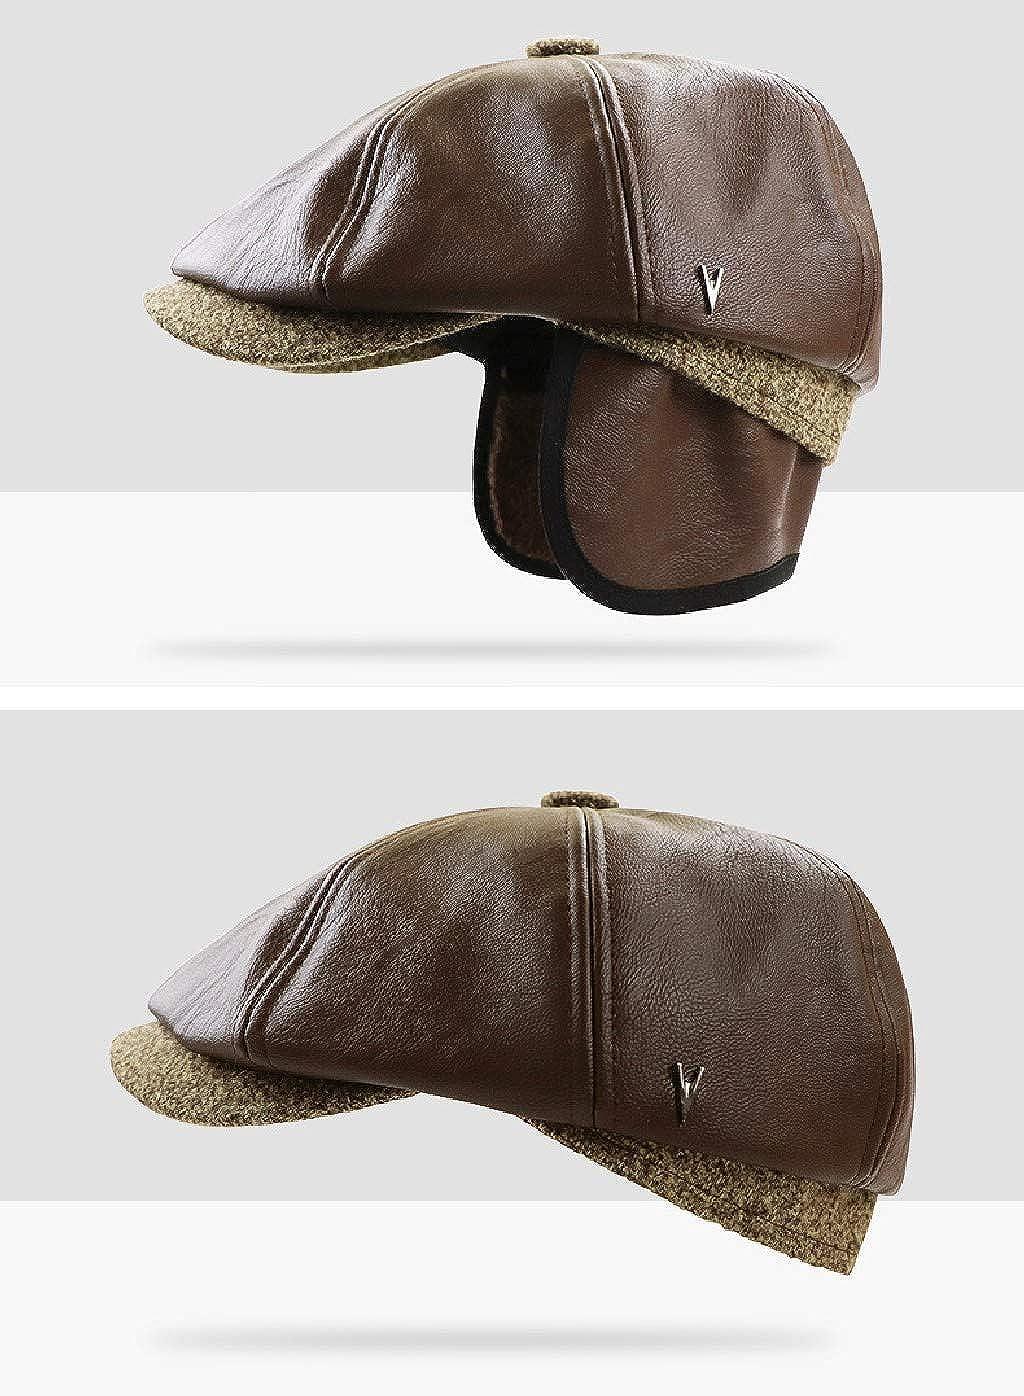 Mens Faux Leather Winter Classic Earmuff Earlfap Newsboy Beanie Beret Visor Cap Hat